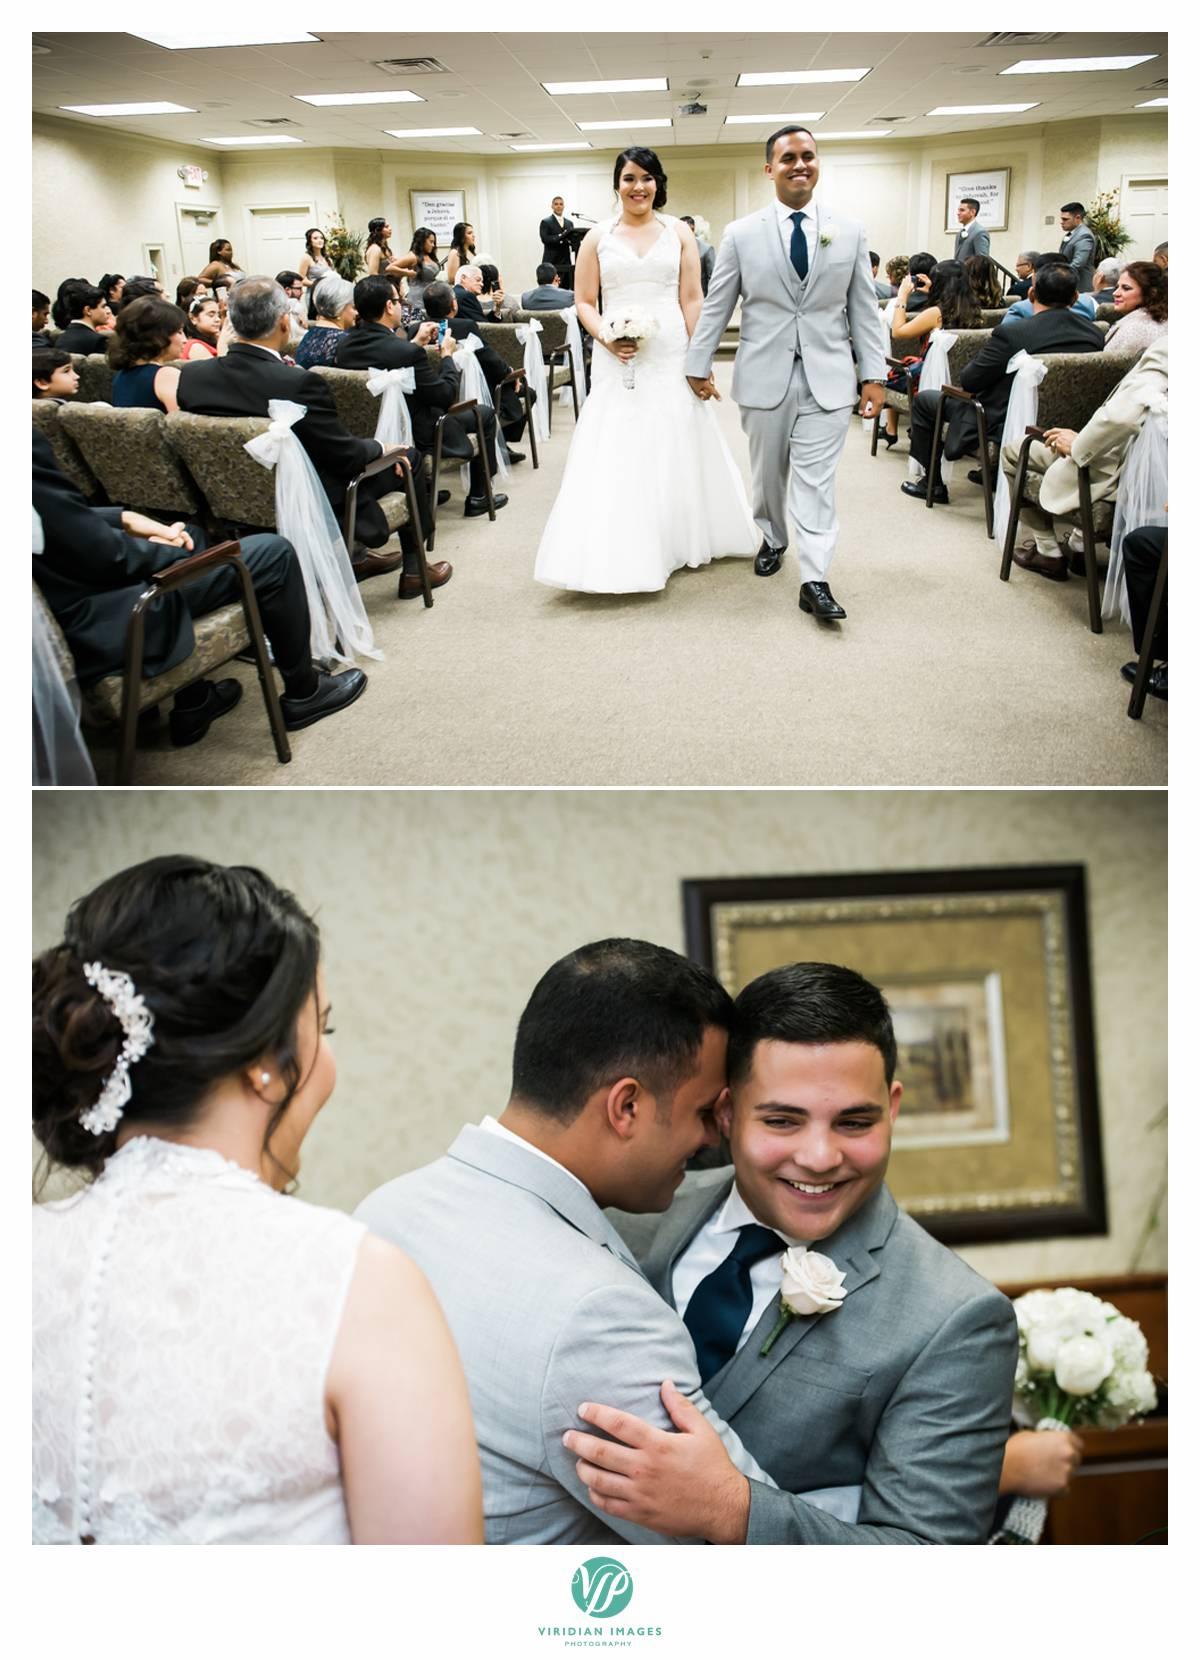 Hilton-Head-Callawassie-Club-Wedding-Viridian-Images-Photography-photo 18